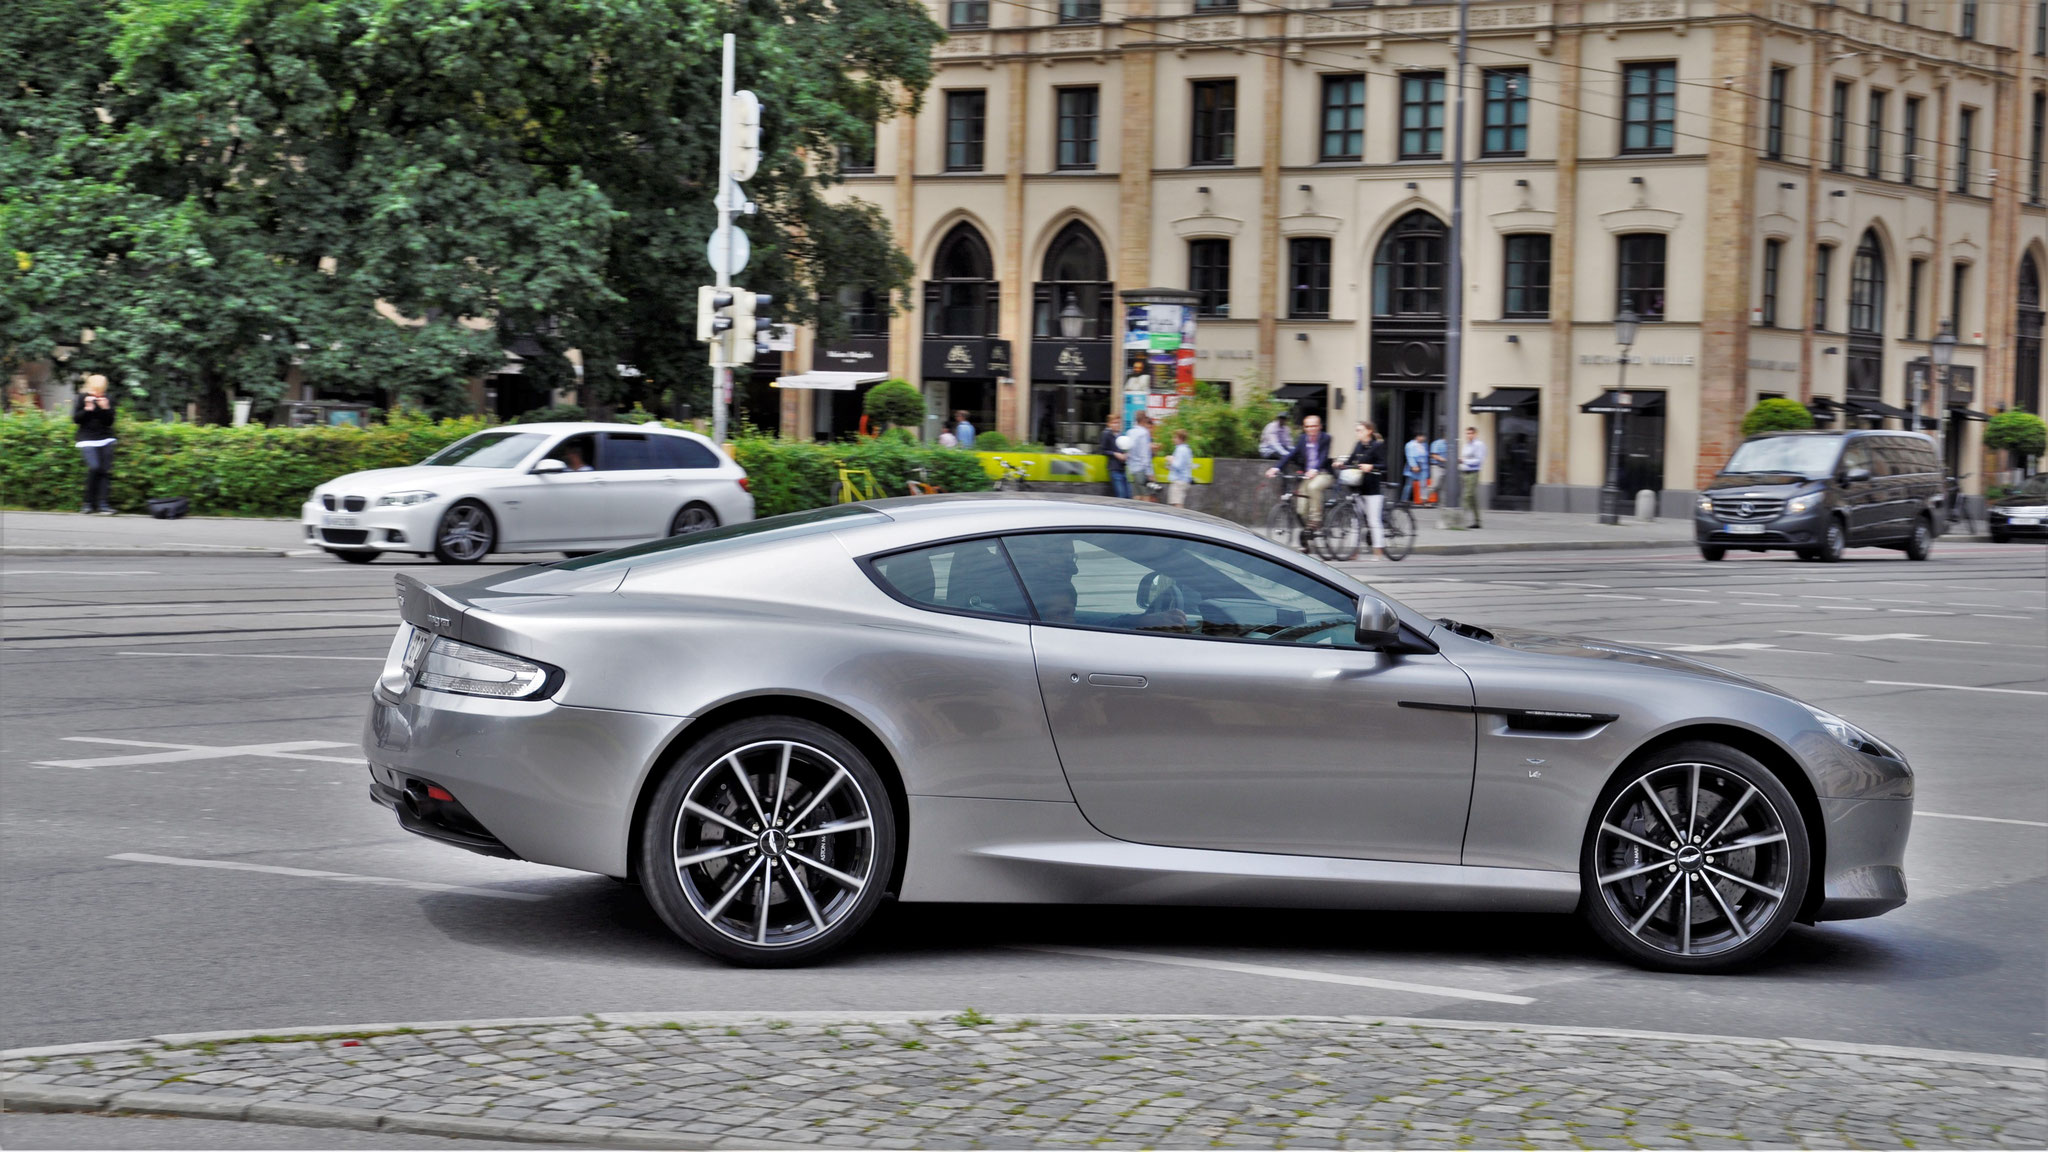 Aston Martin DB9 GT Coupé - GM-GT-2375